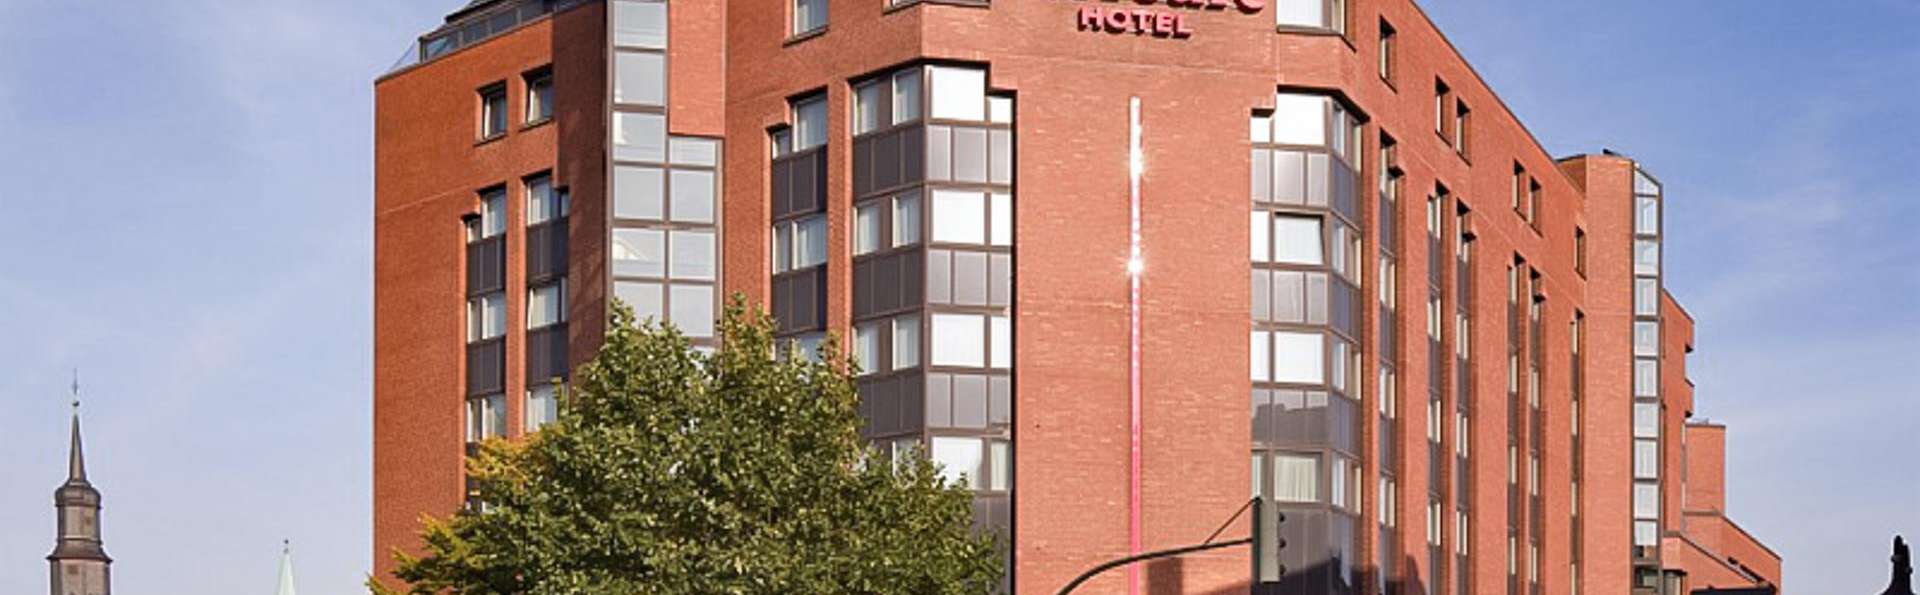 Mercure Hotel Hamm - EDIT_FRONT_01.jpg